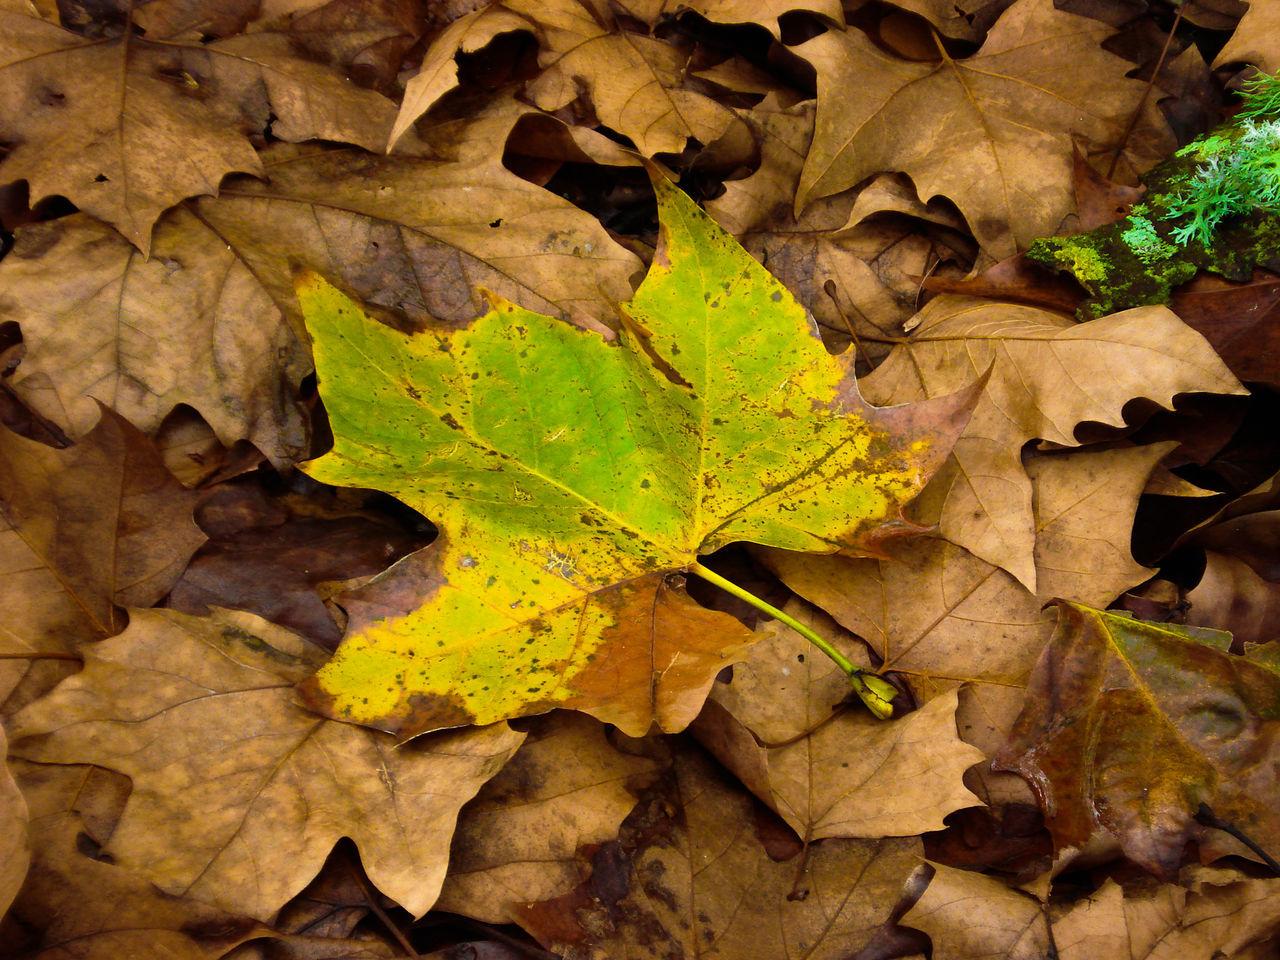 Fallen Green Maple Leaf Among Dry Leaves